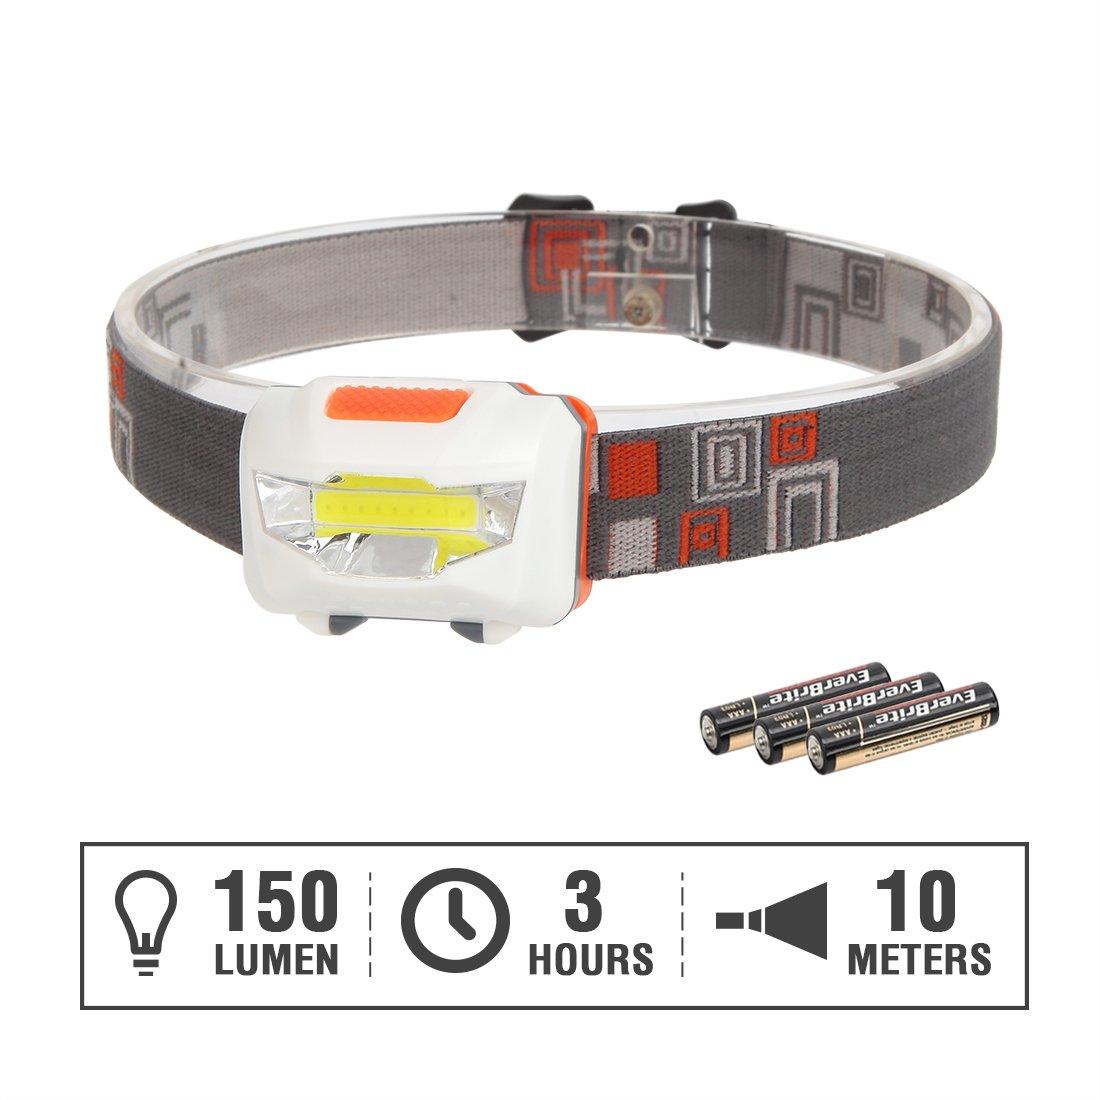 Alkaline Batteries Included Hang Zhou Great Star Industrial Co EverBrite LED Headlamp Set 5-pack 3 Modes COB Super Bright Head Light with Adjustable Band Strap LTD